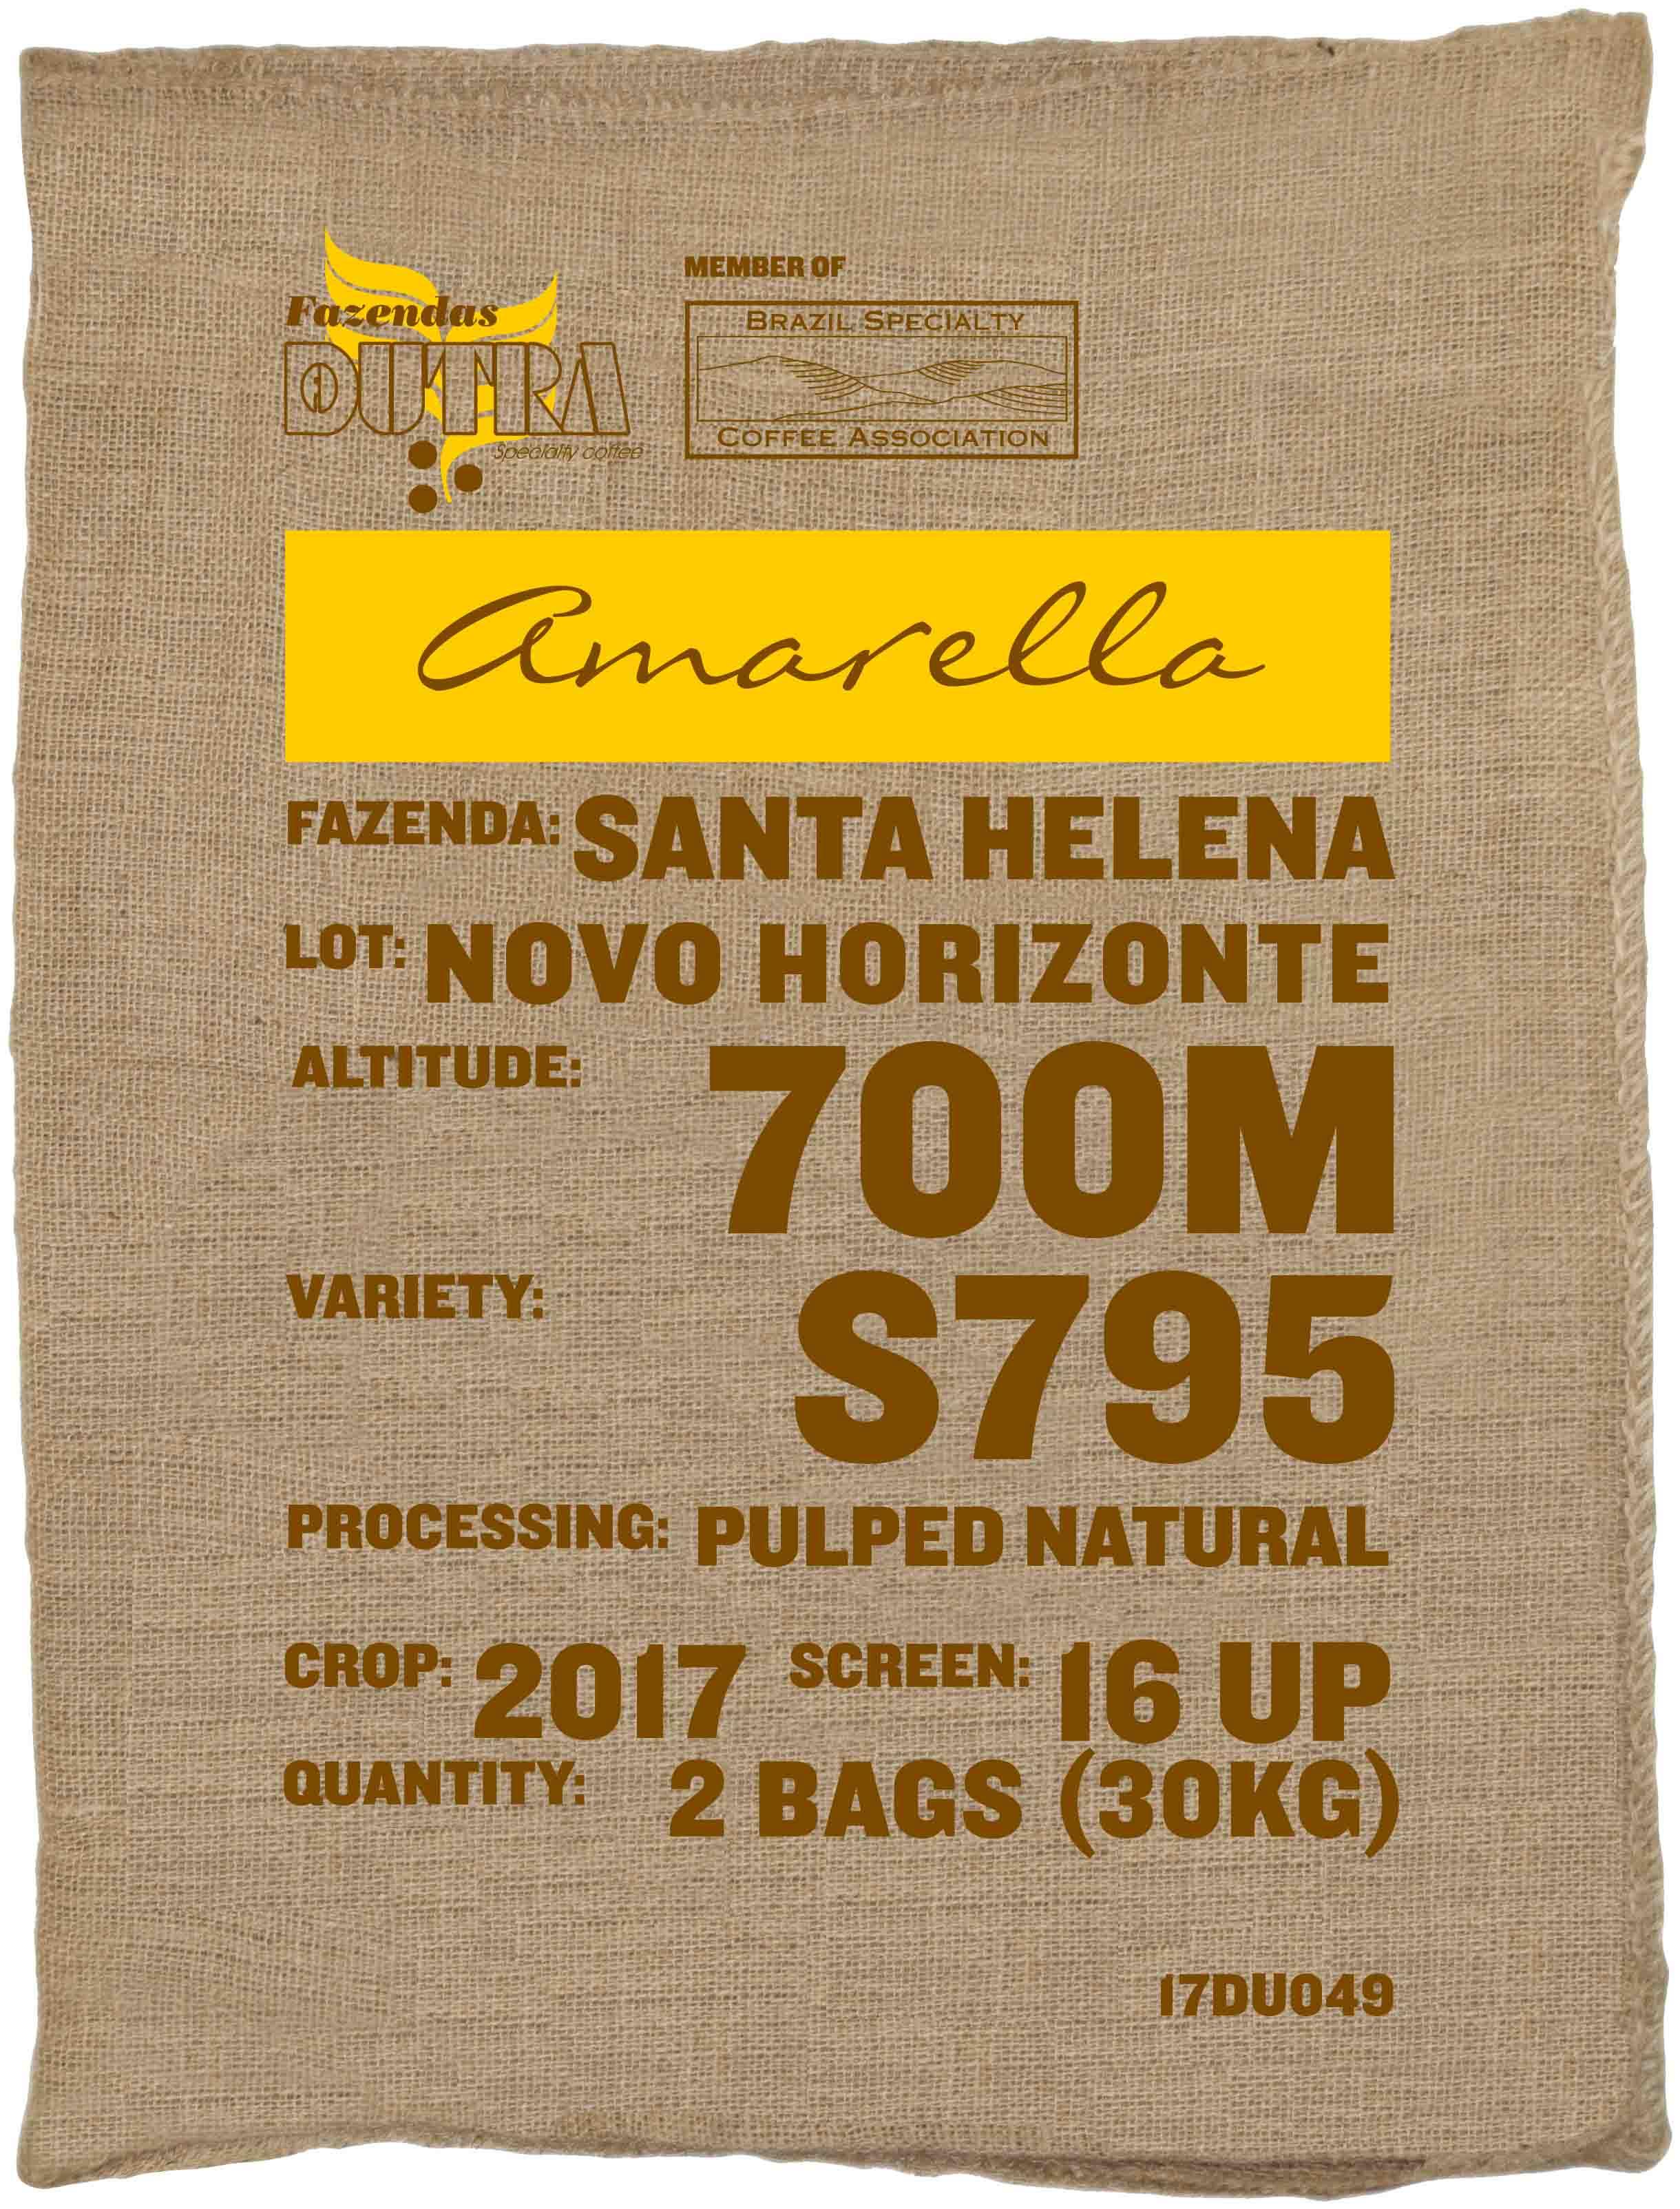 Ein Rohkaffeesack amarella Parzellenkaffee Varietät S795. Fazendas Dutra Lot Novo Horizonte.